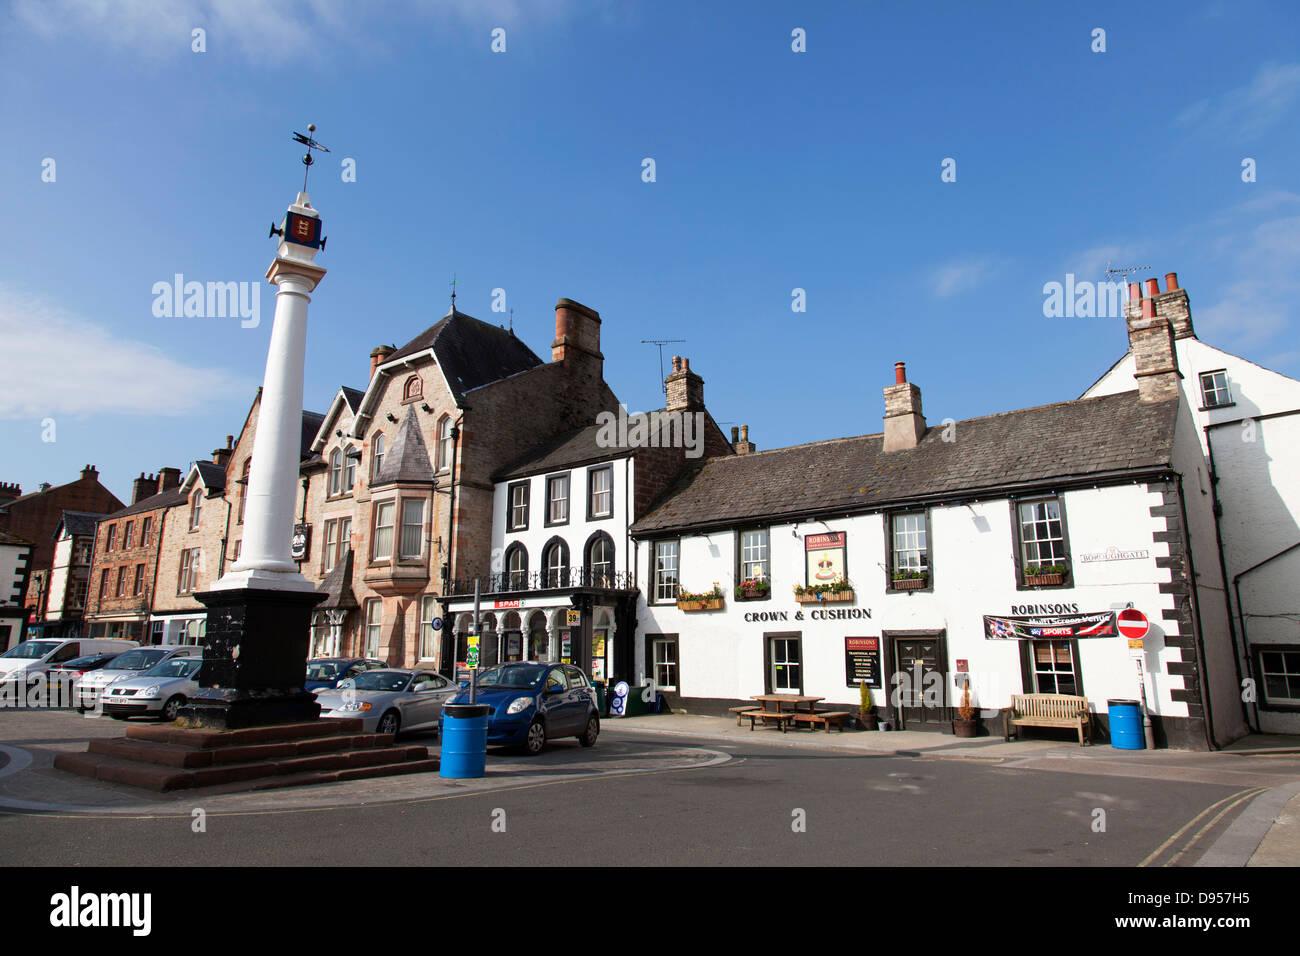 The Market Cross, Boroughgate, Appleby-in-Westmorland, Cumbria, England, U.K. - Stock Image